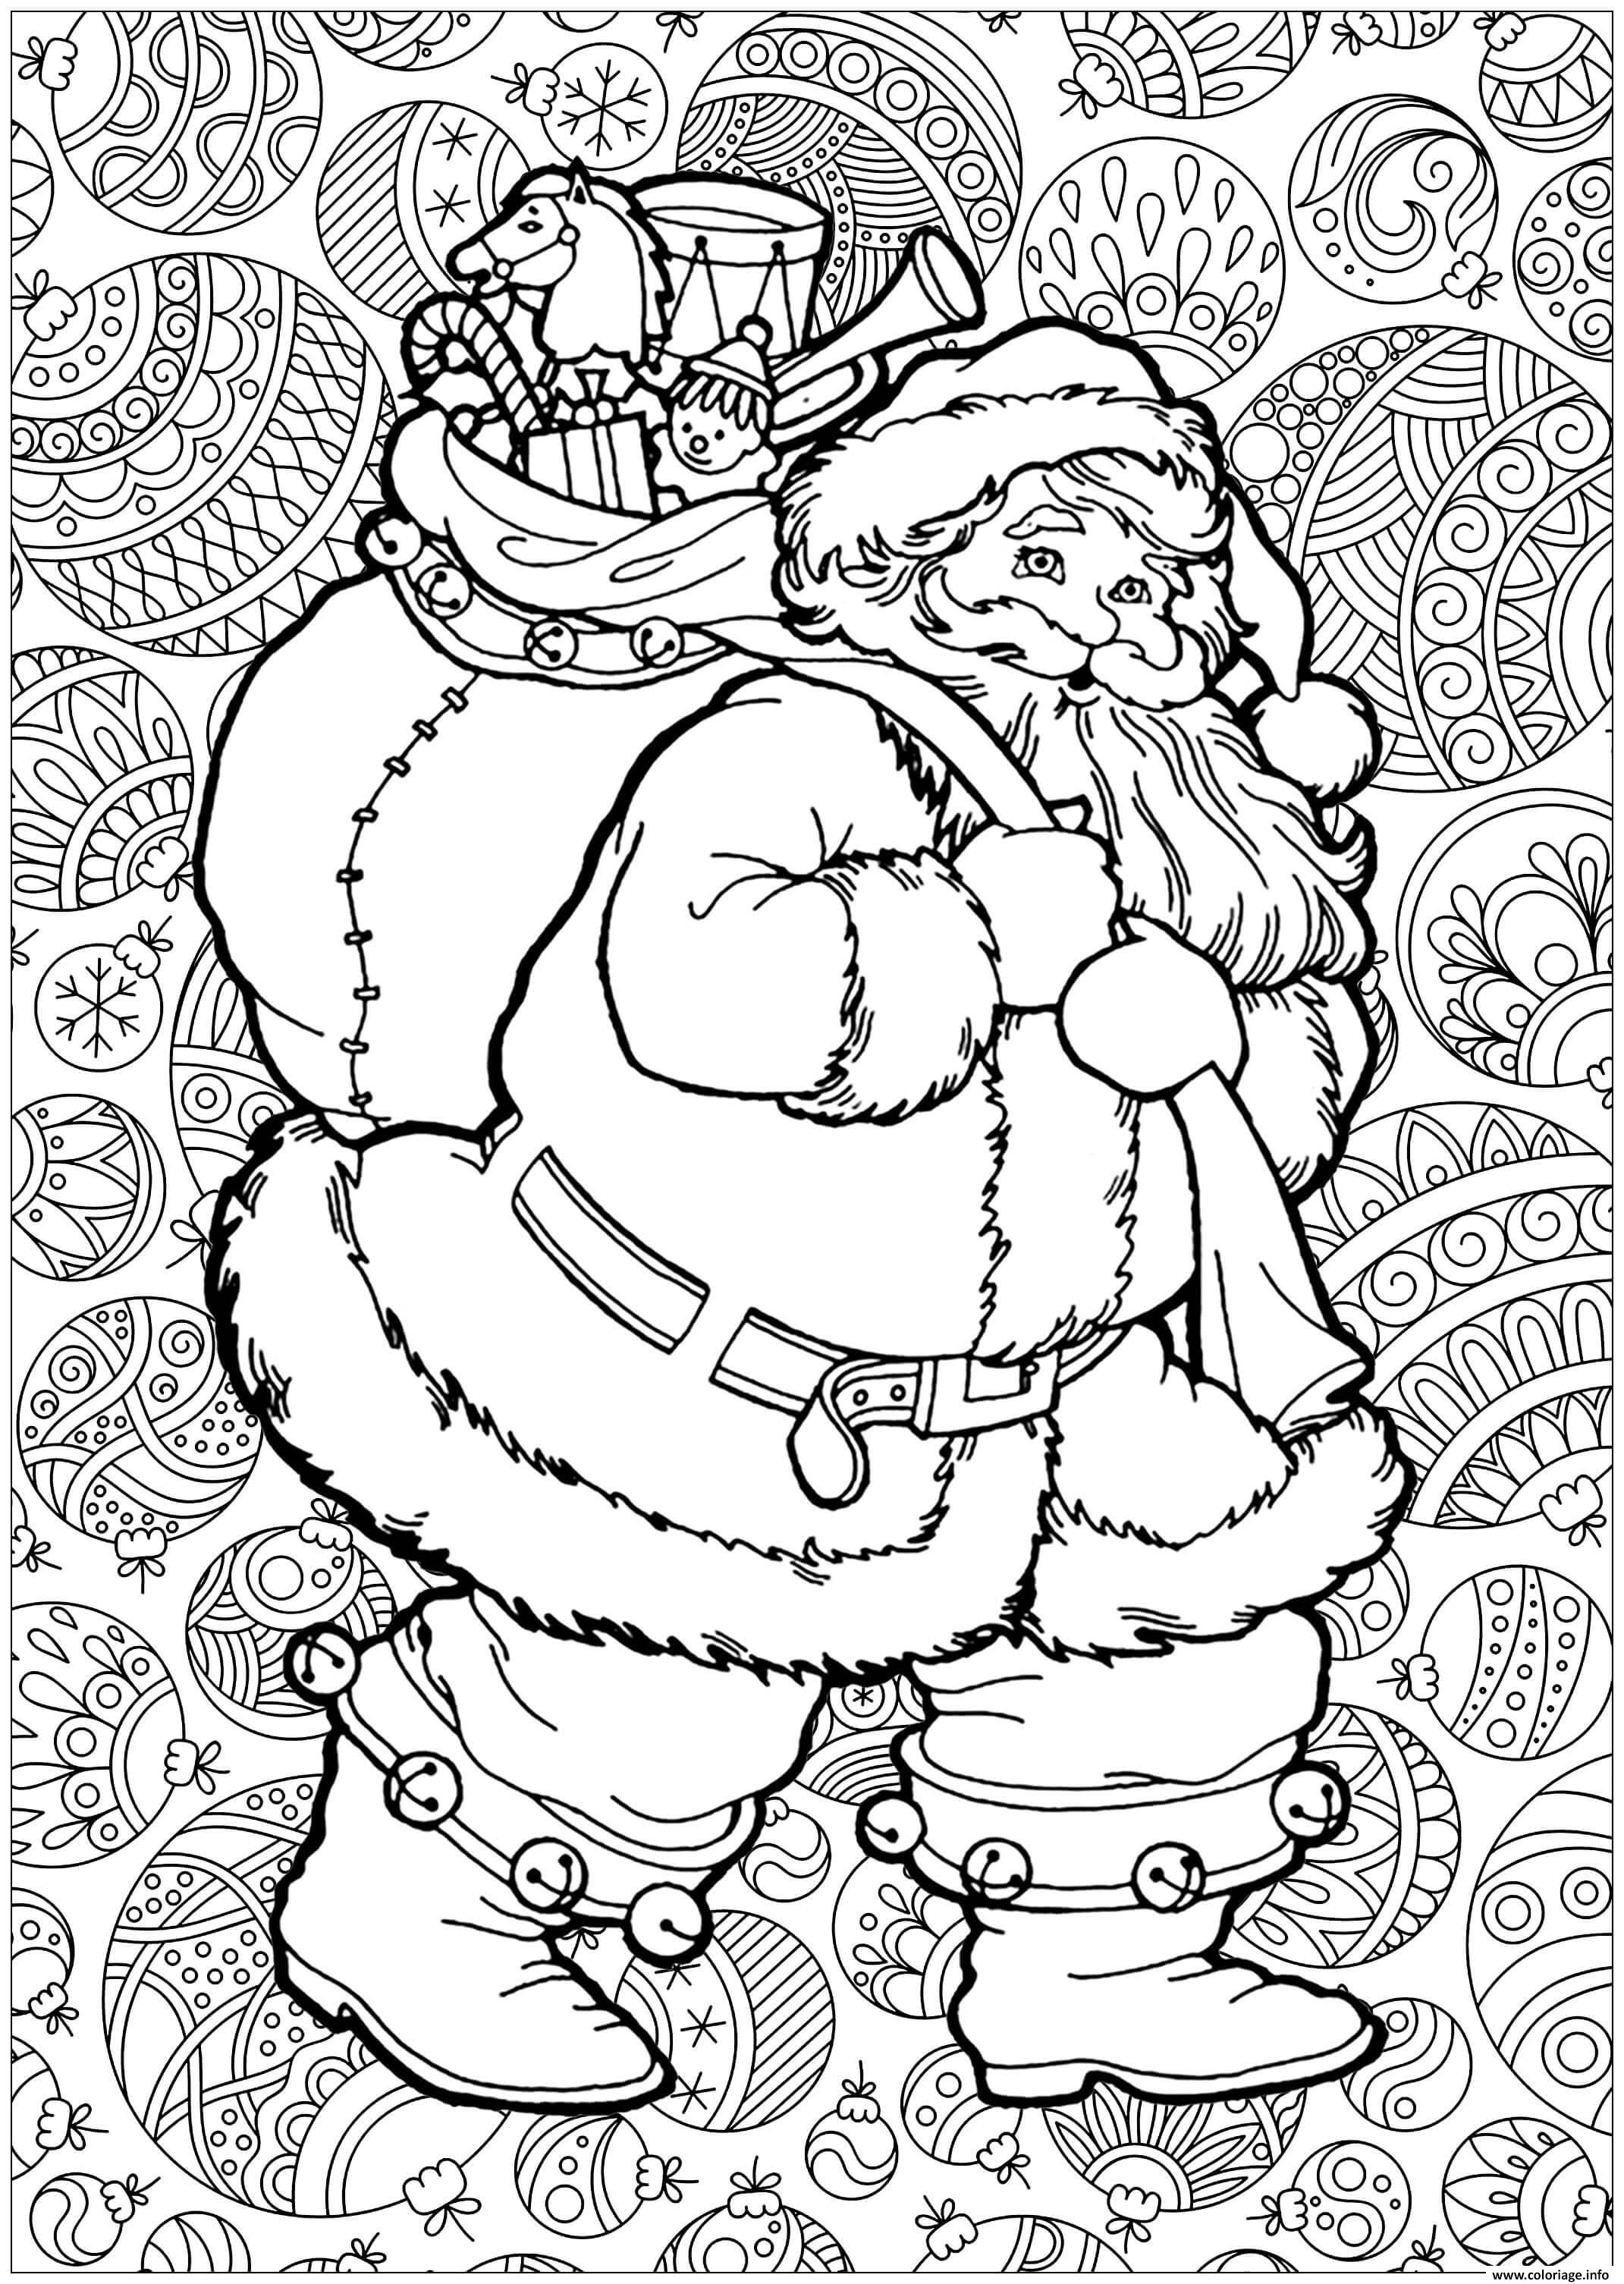 Beau Image A Imprimer Du Pere Noel